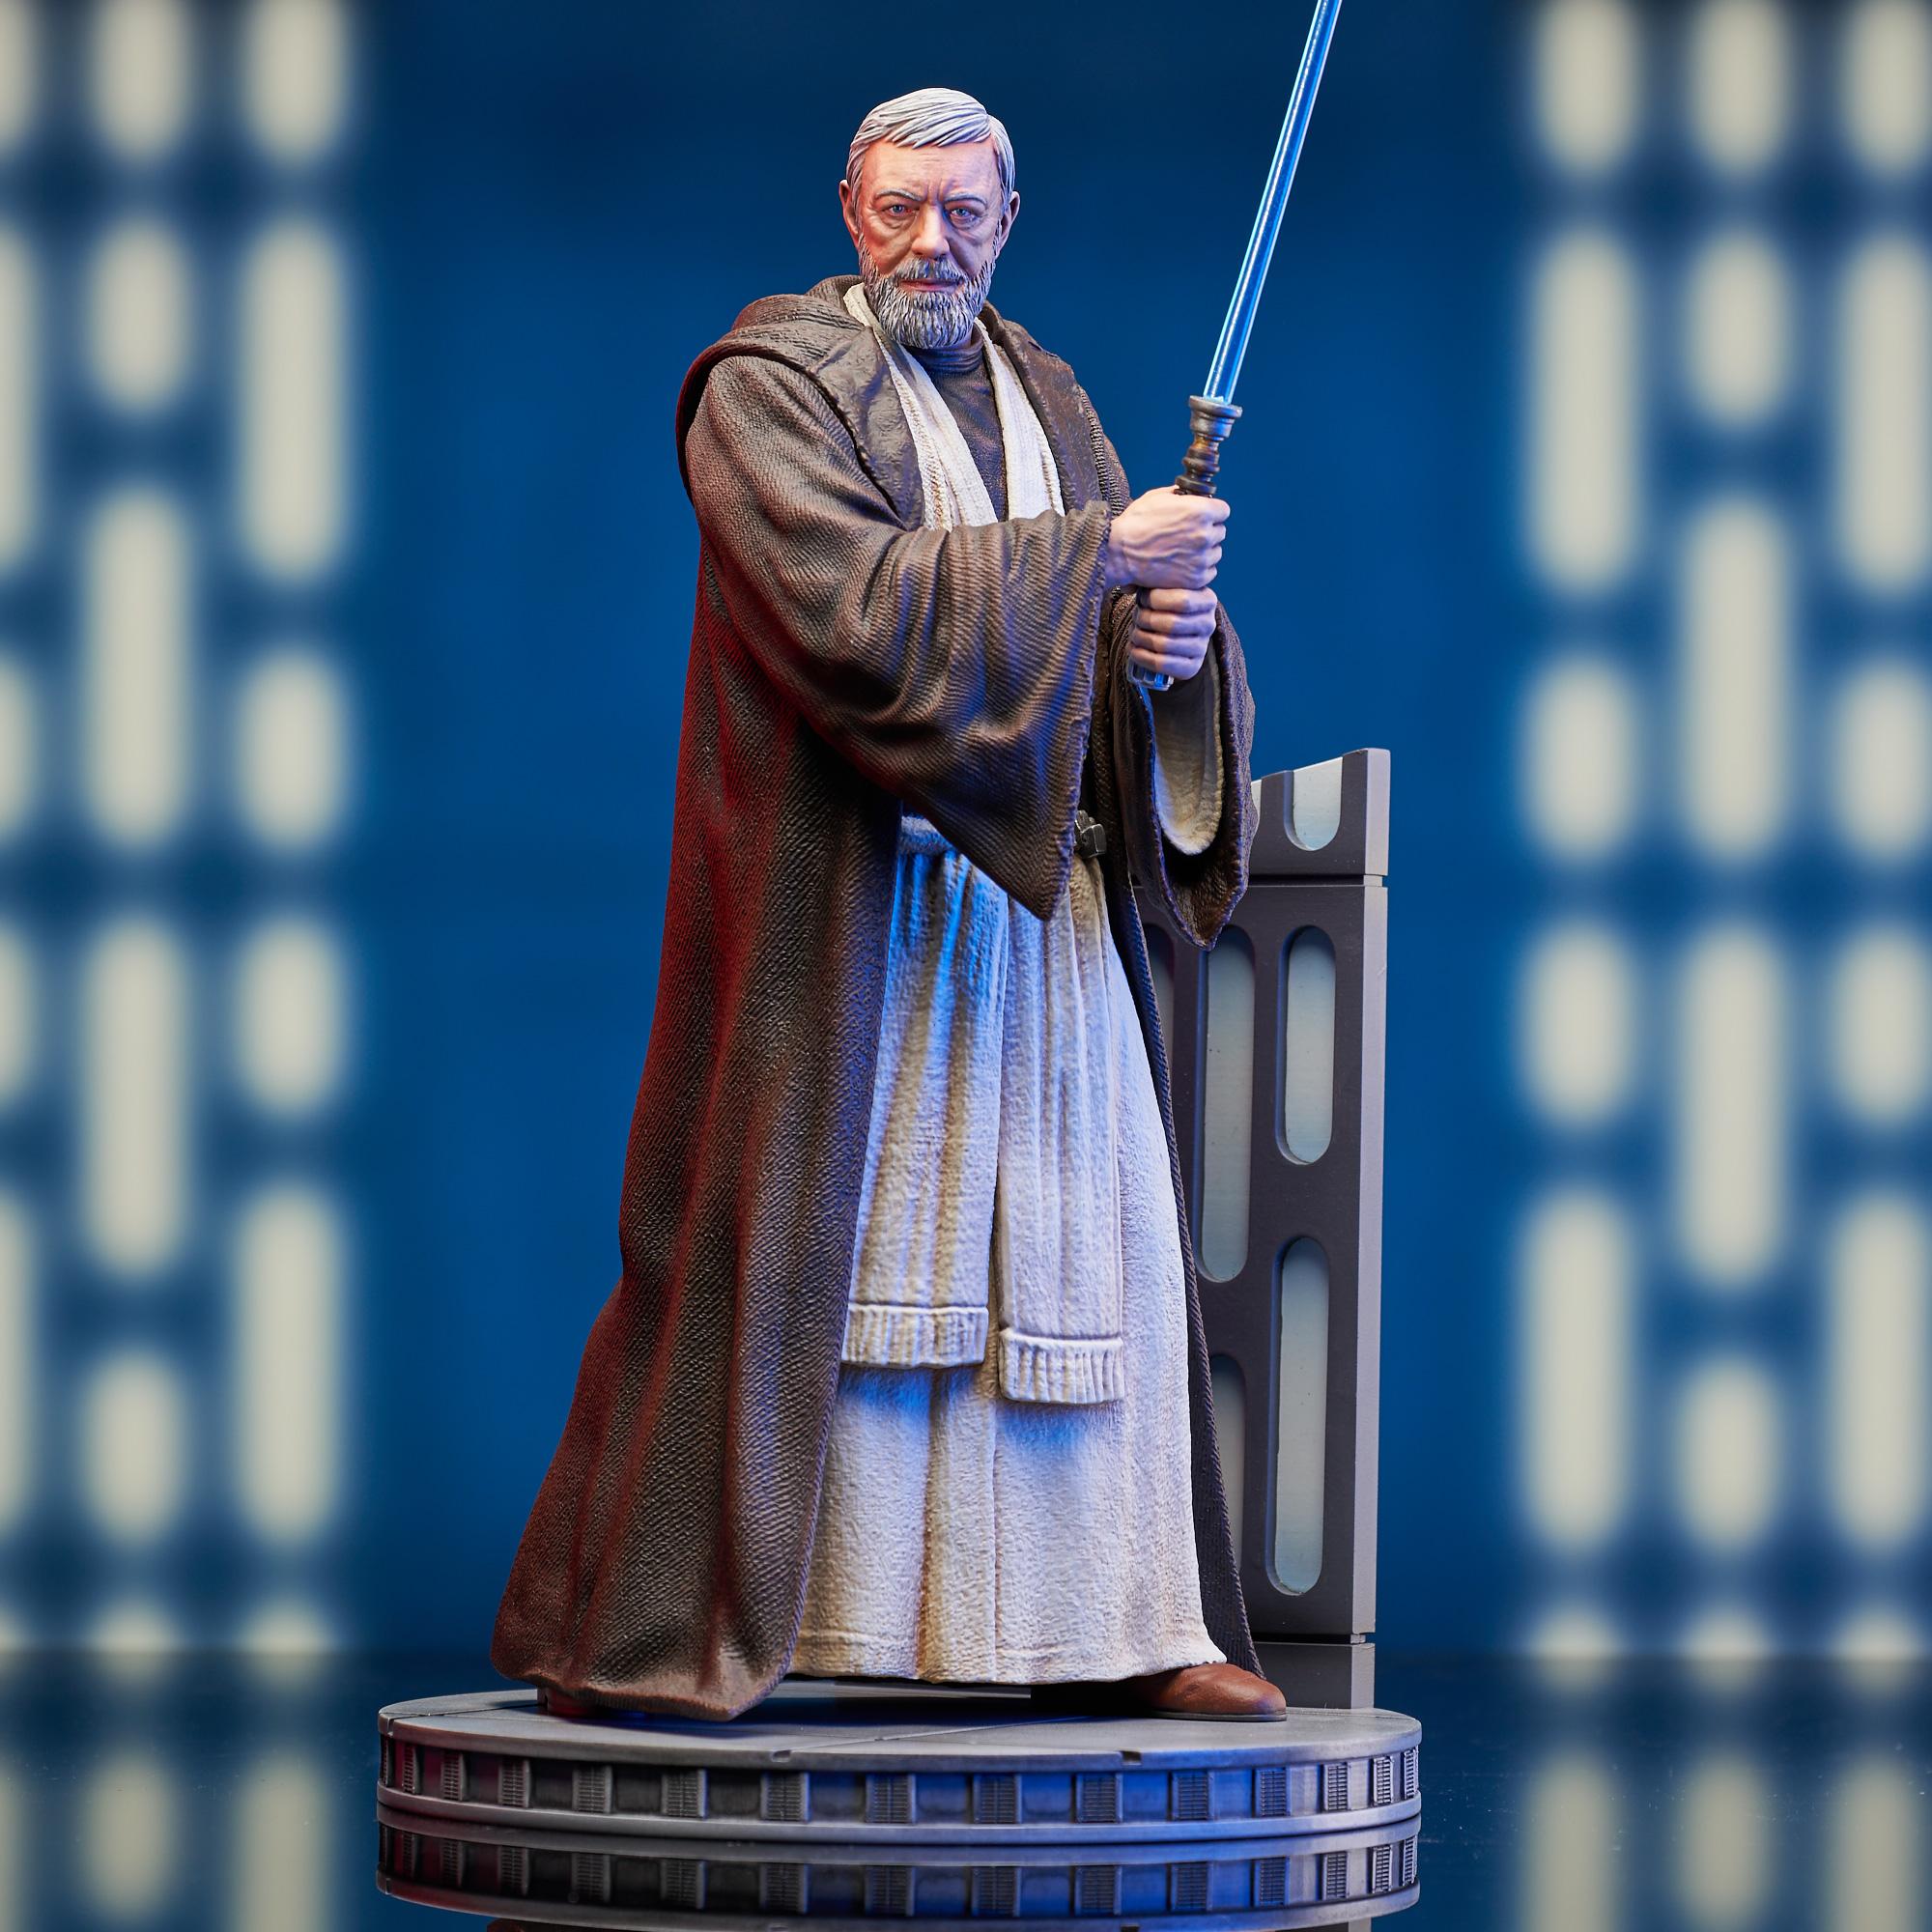 Star Wars: A New Hope™ - Ben Kenobi™ Milestone Statue